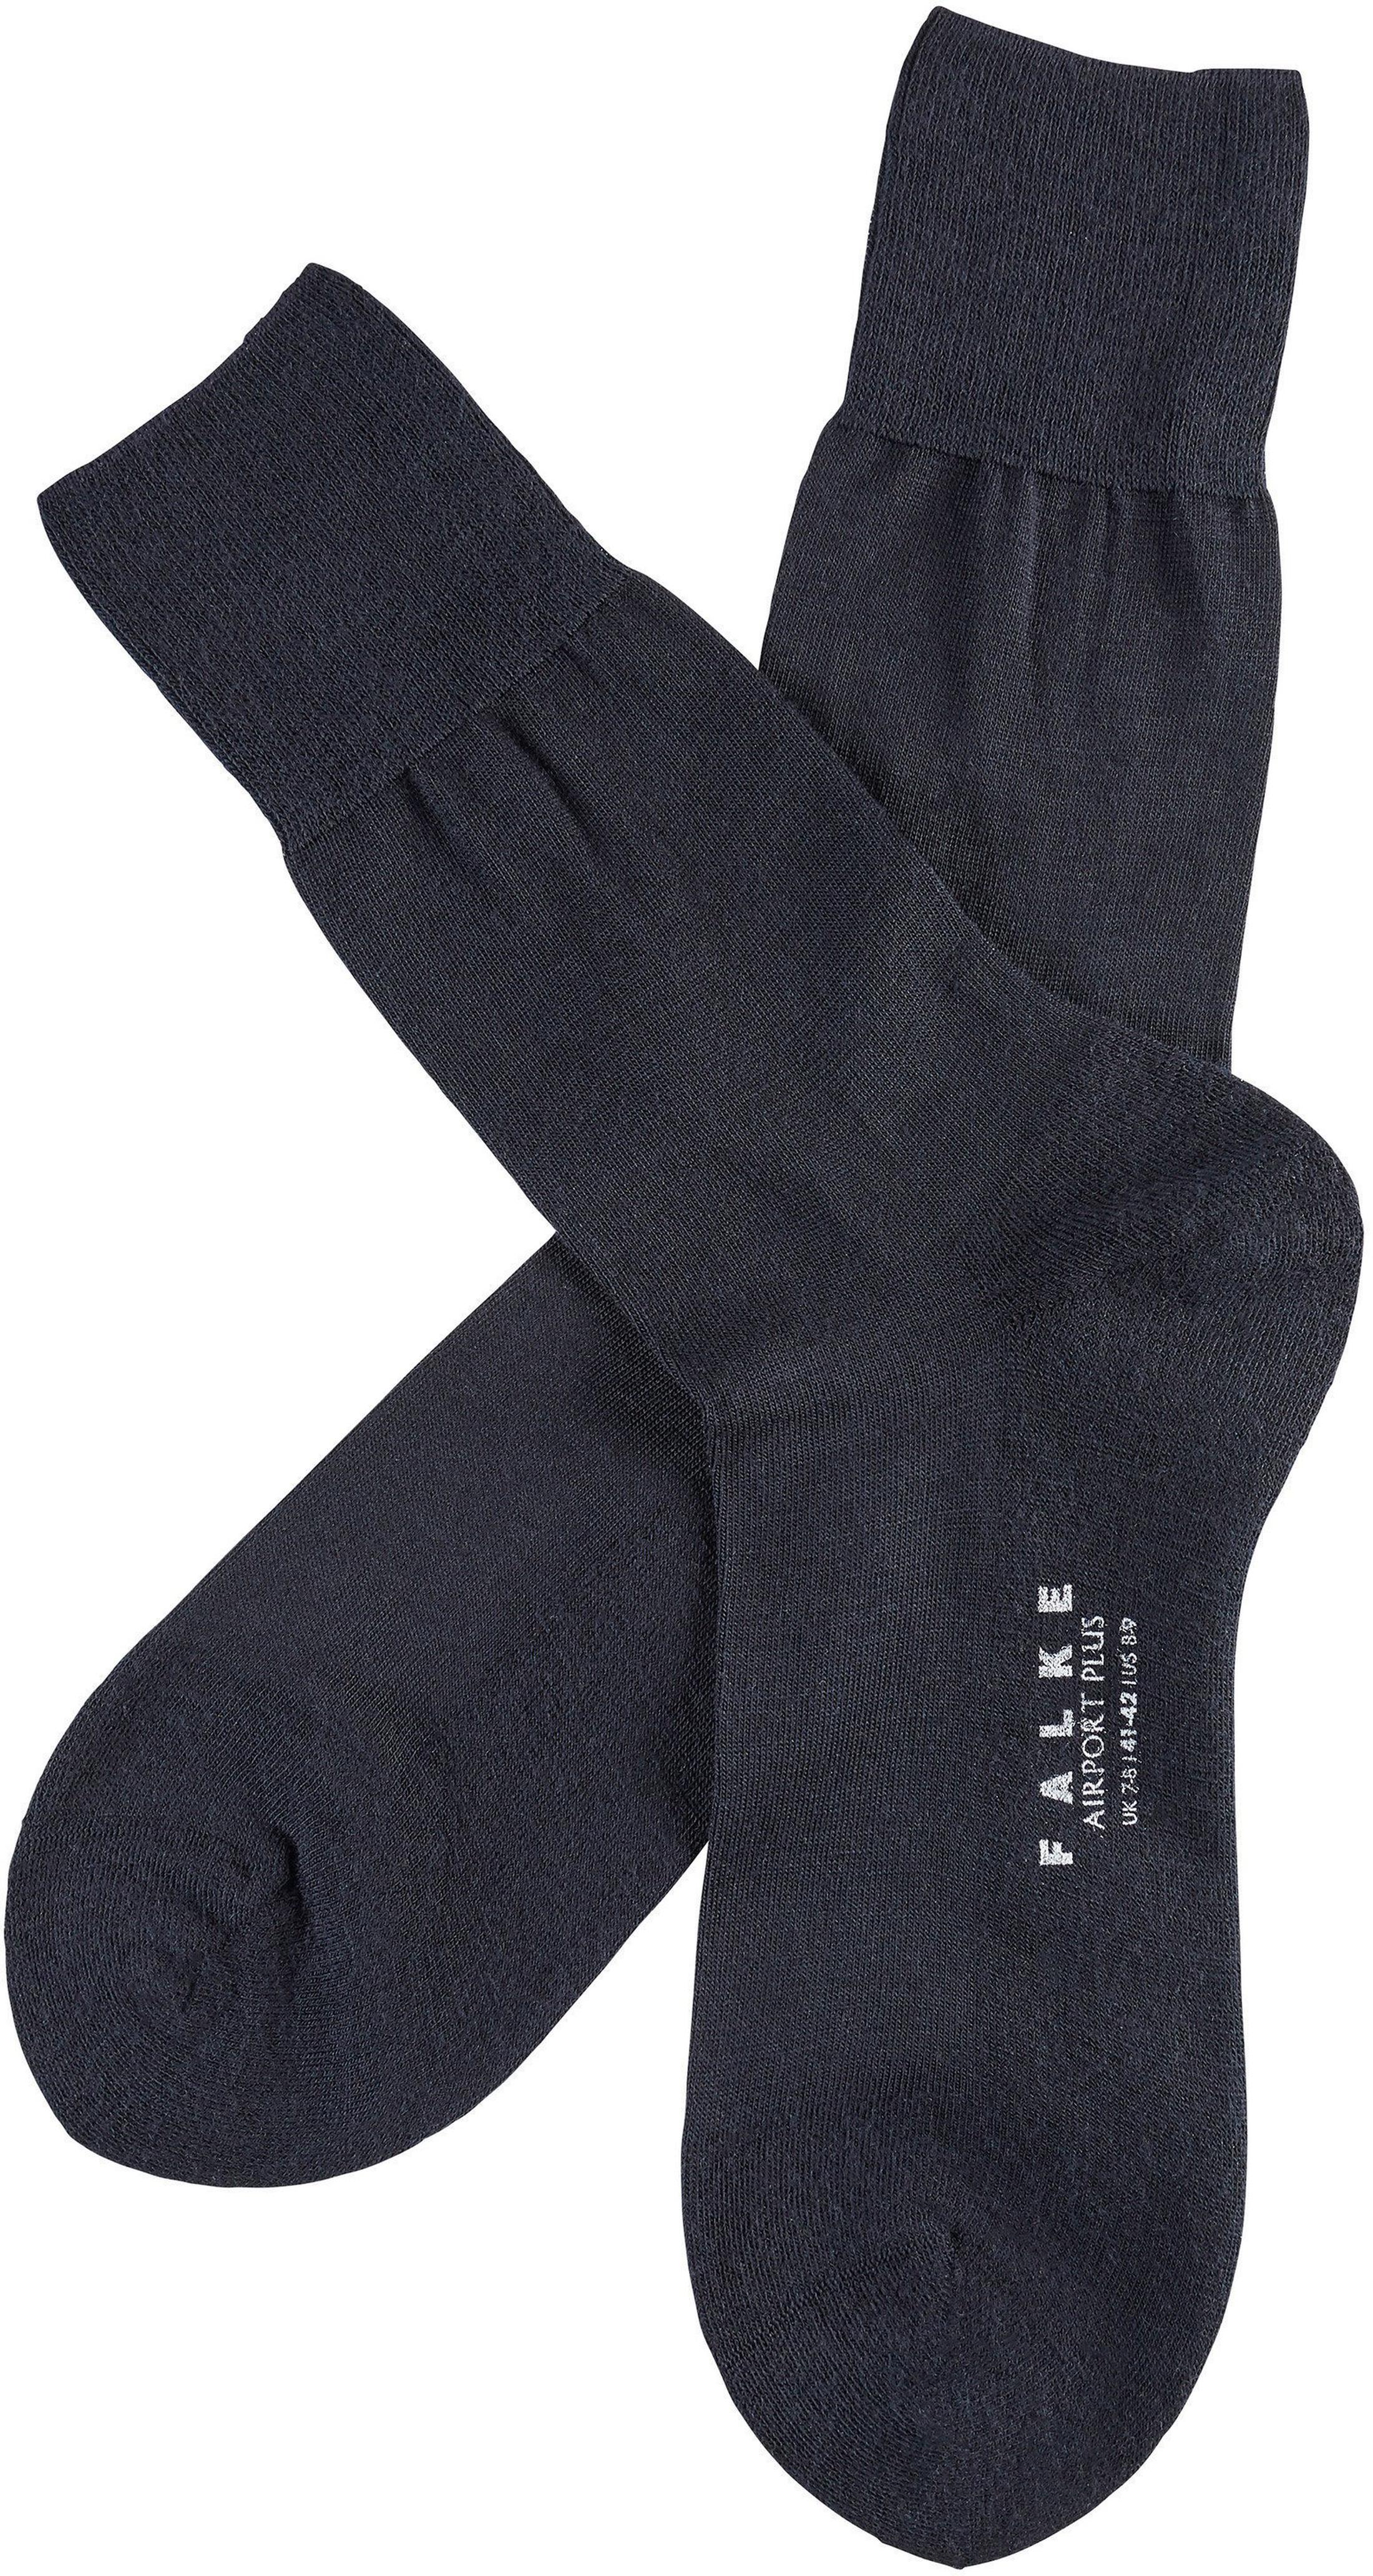 Falke Airport PLUS Socks Navy 6370